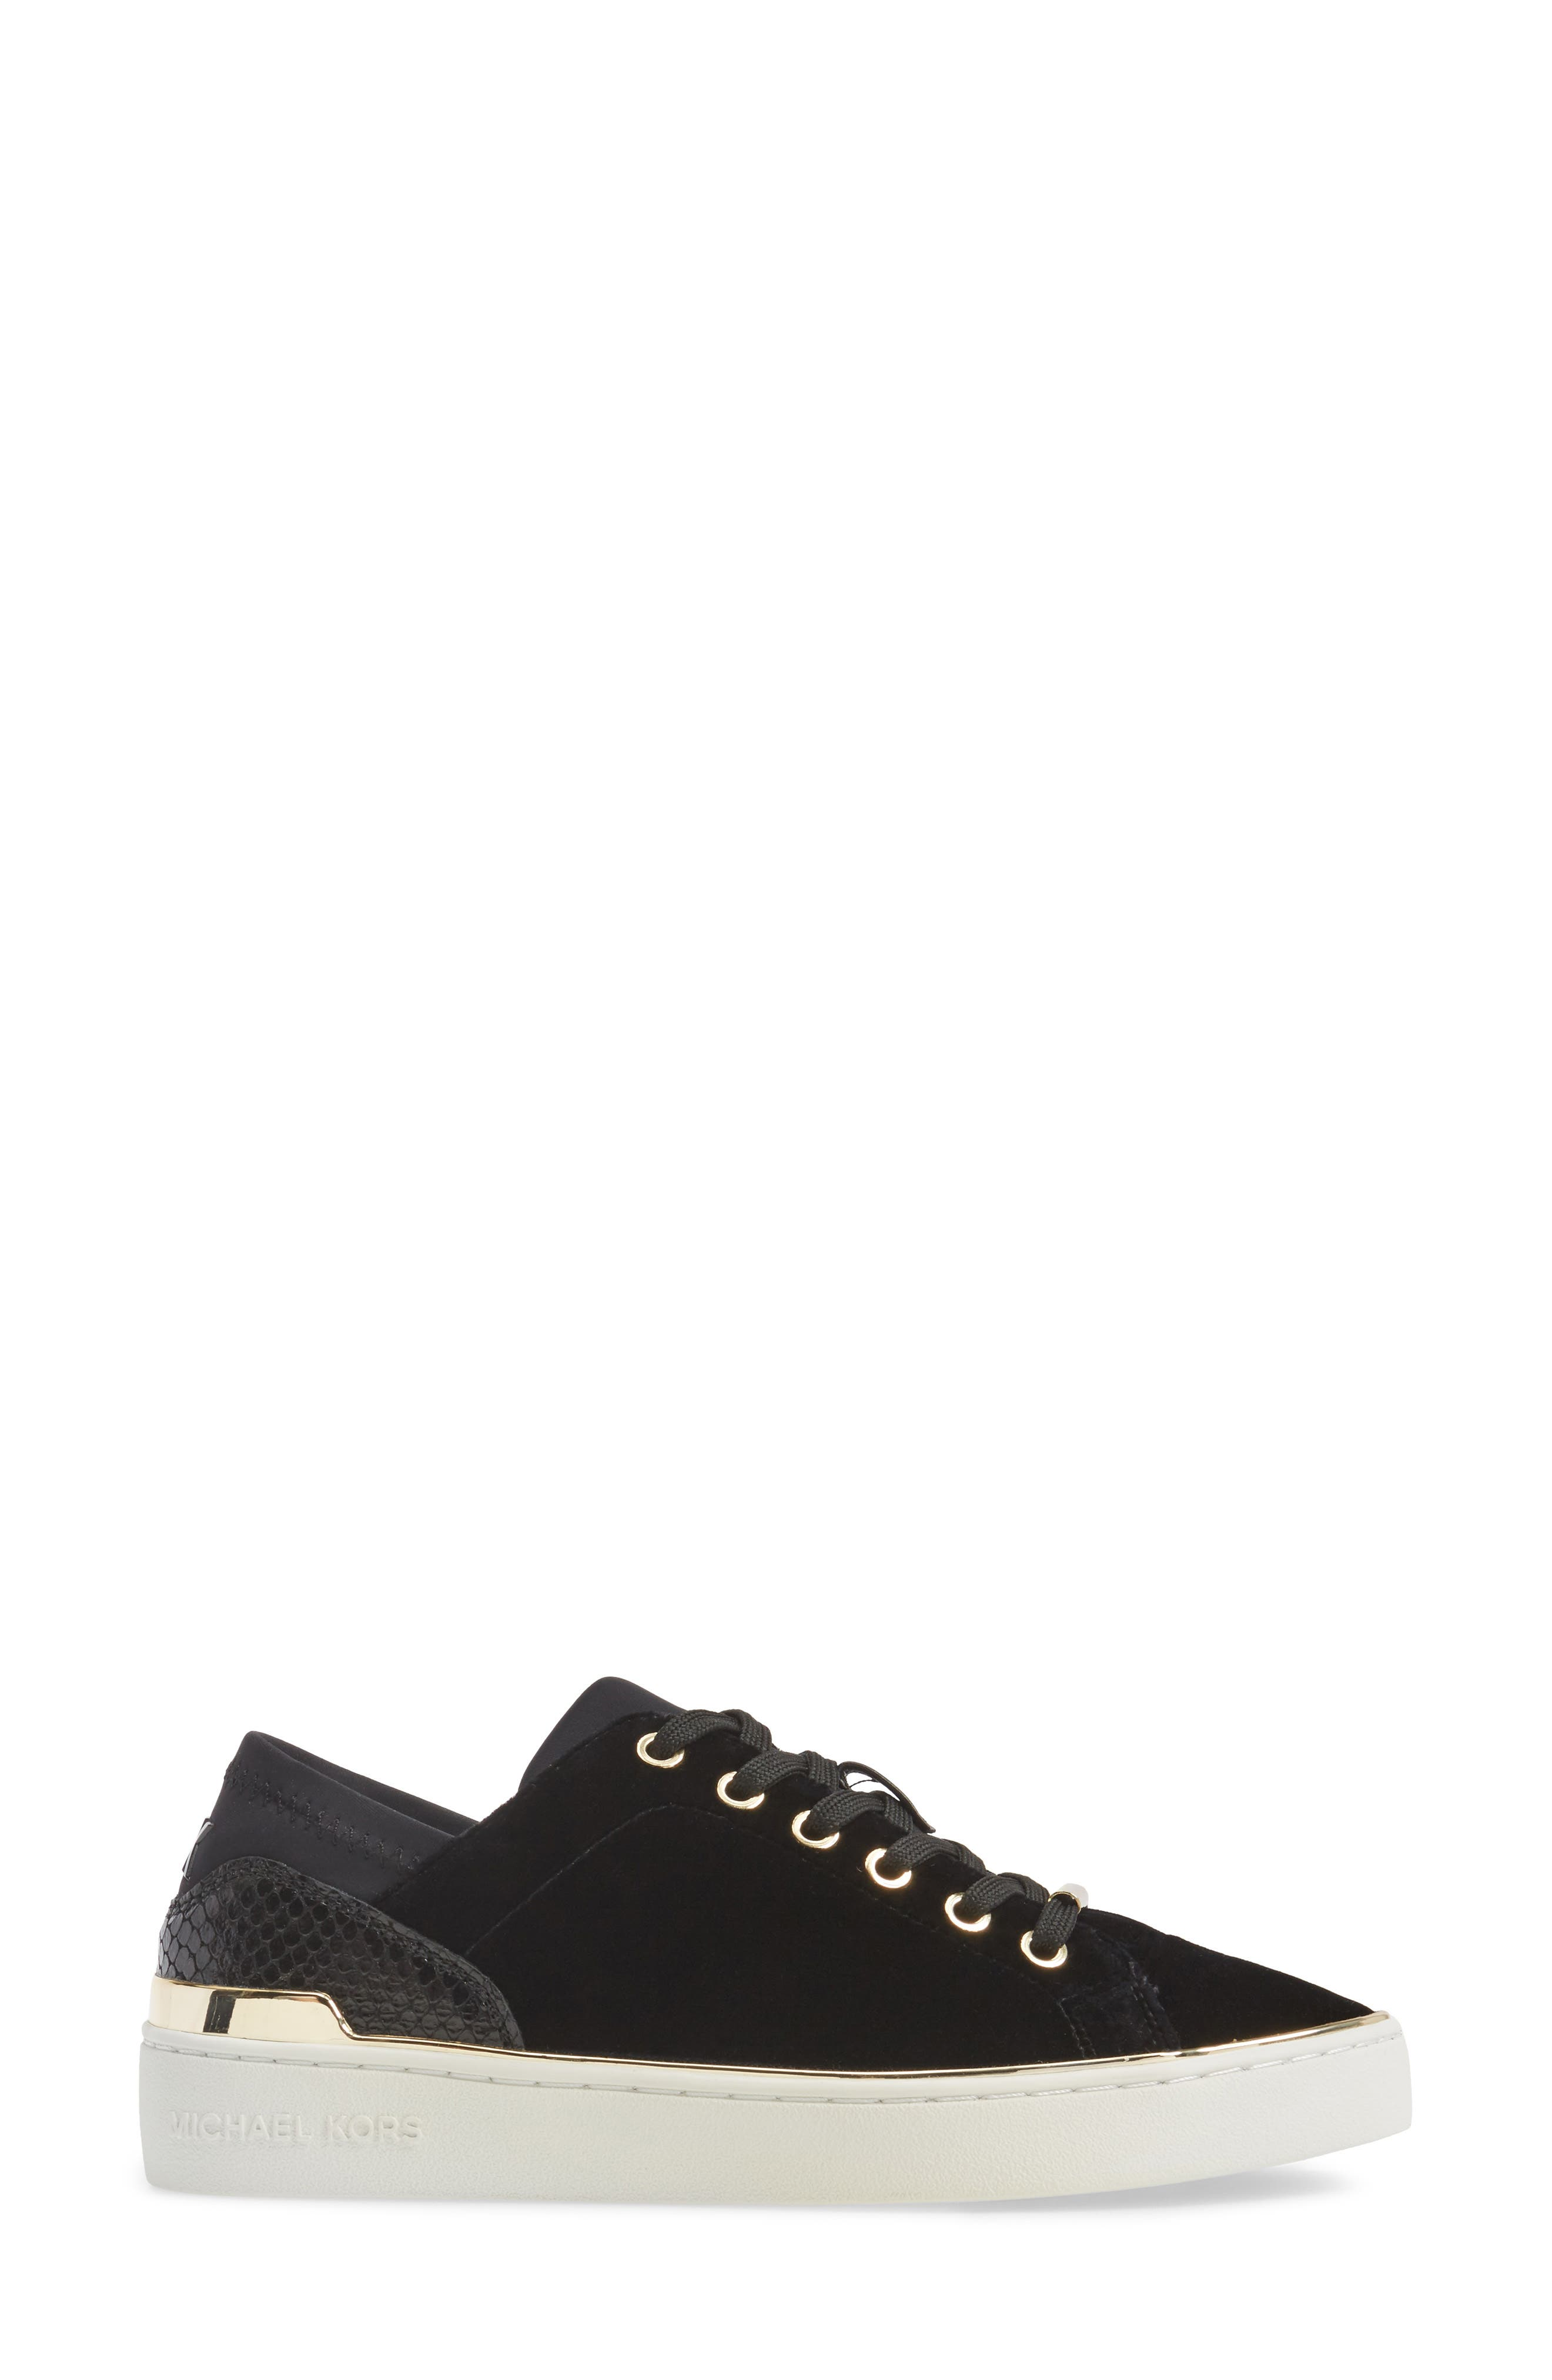 Scout Sneaker,                             Alternate thumbnail 3, color,                             Black